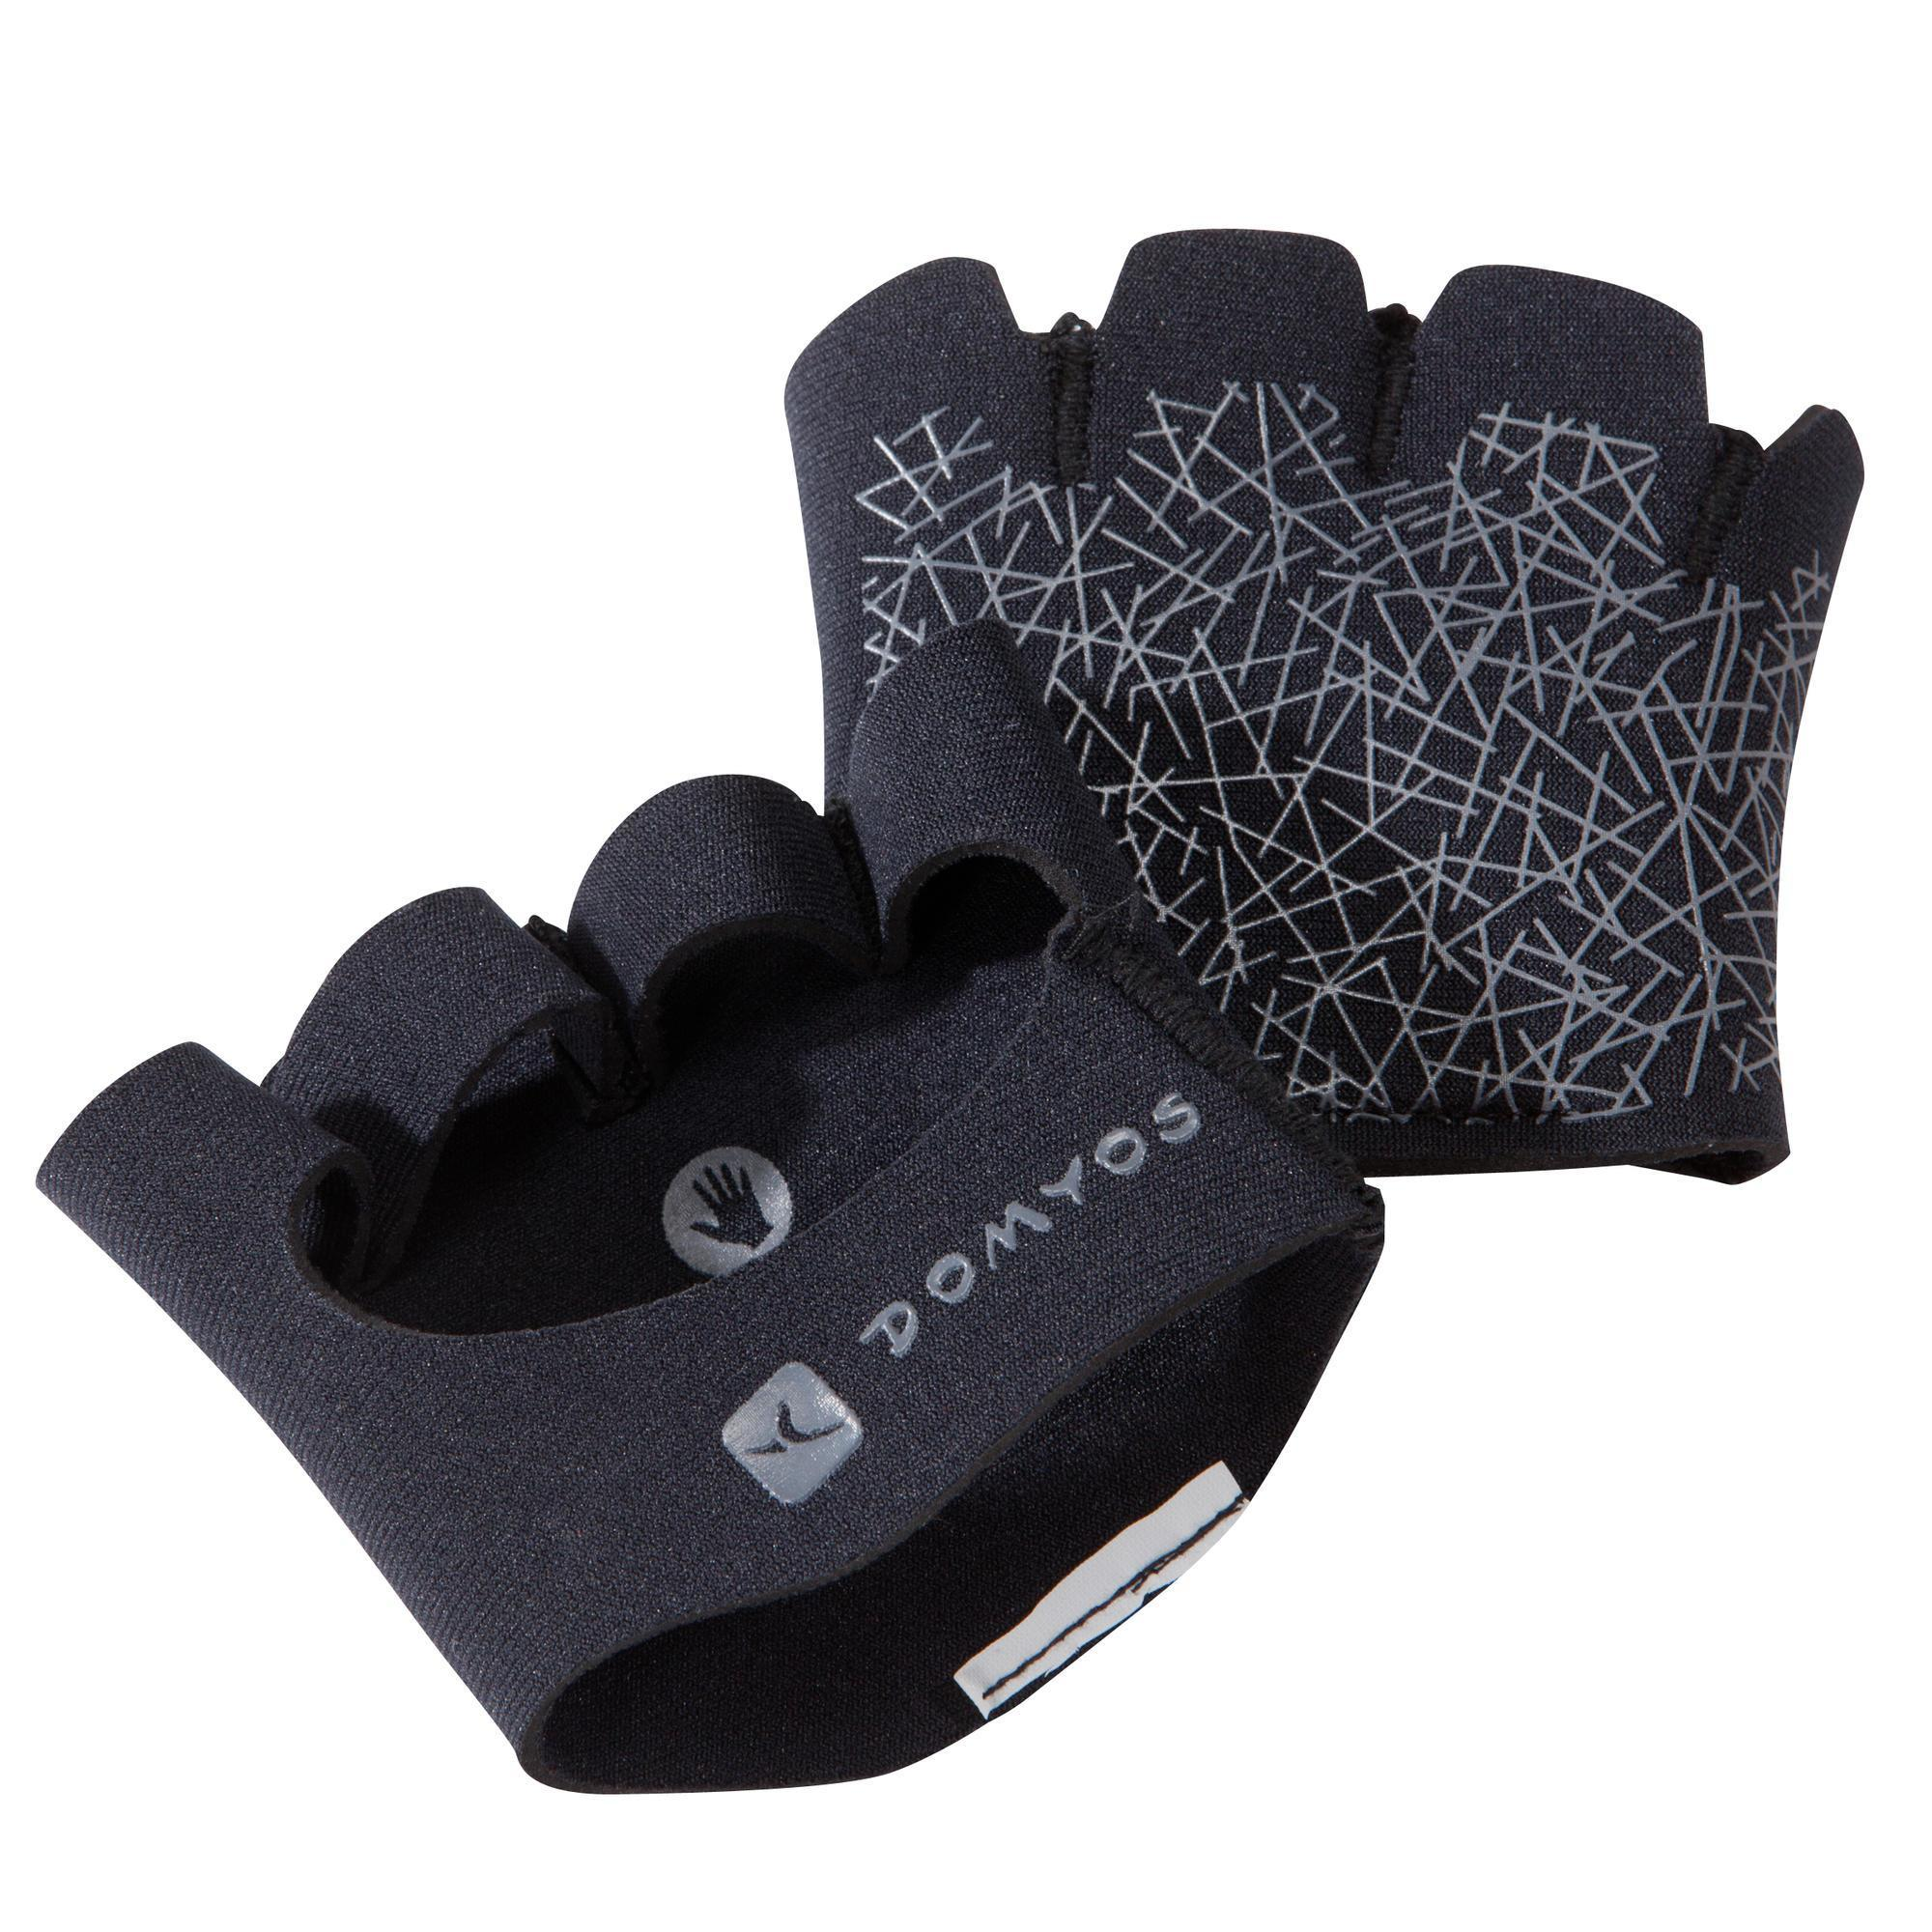 Domyos Handschoenen - krachttraining - spiertraining - Grip pad Training zwart